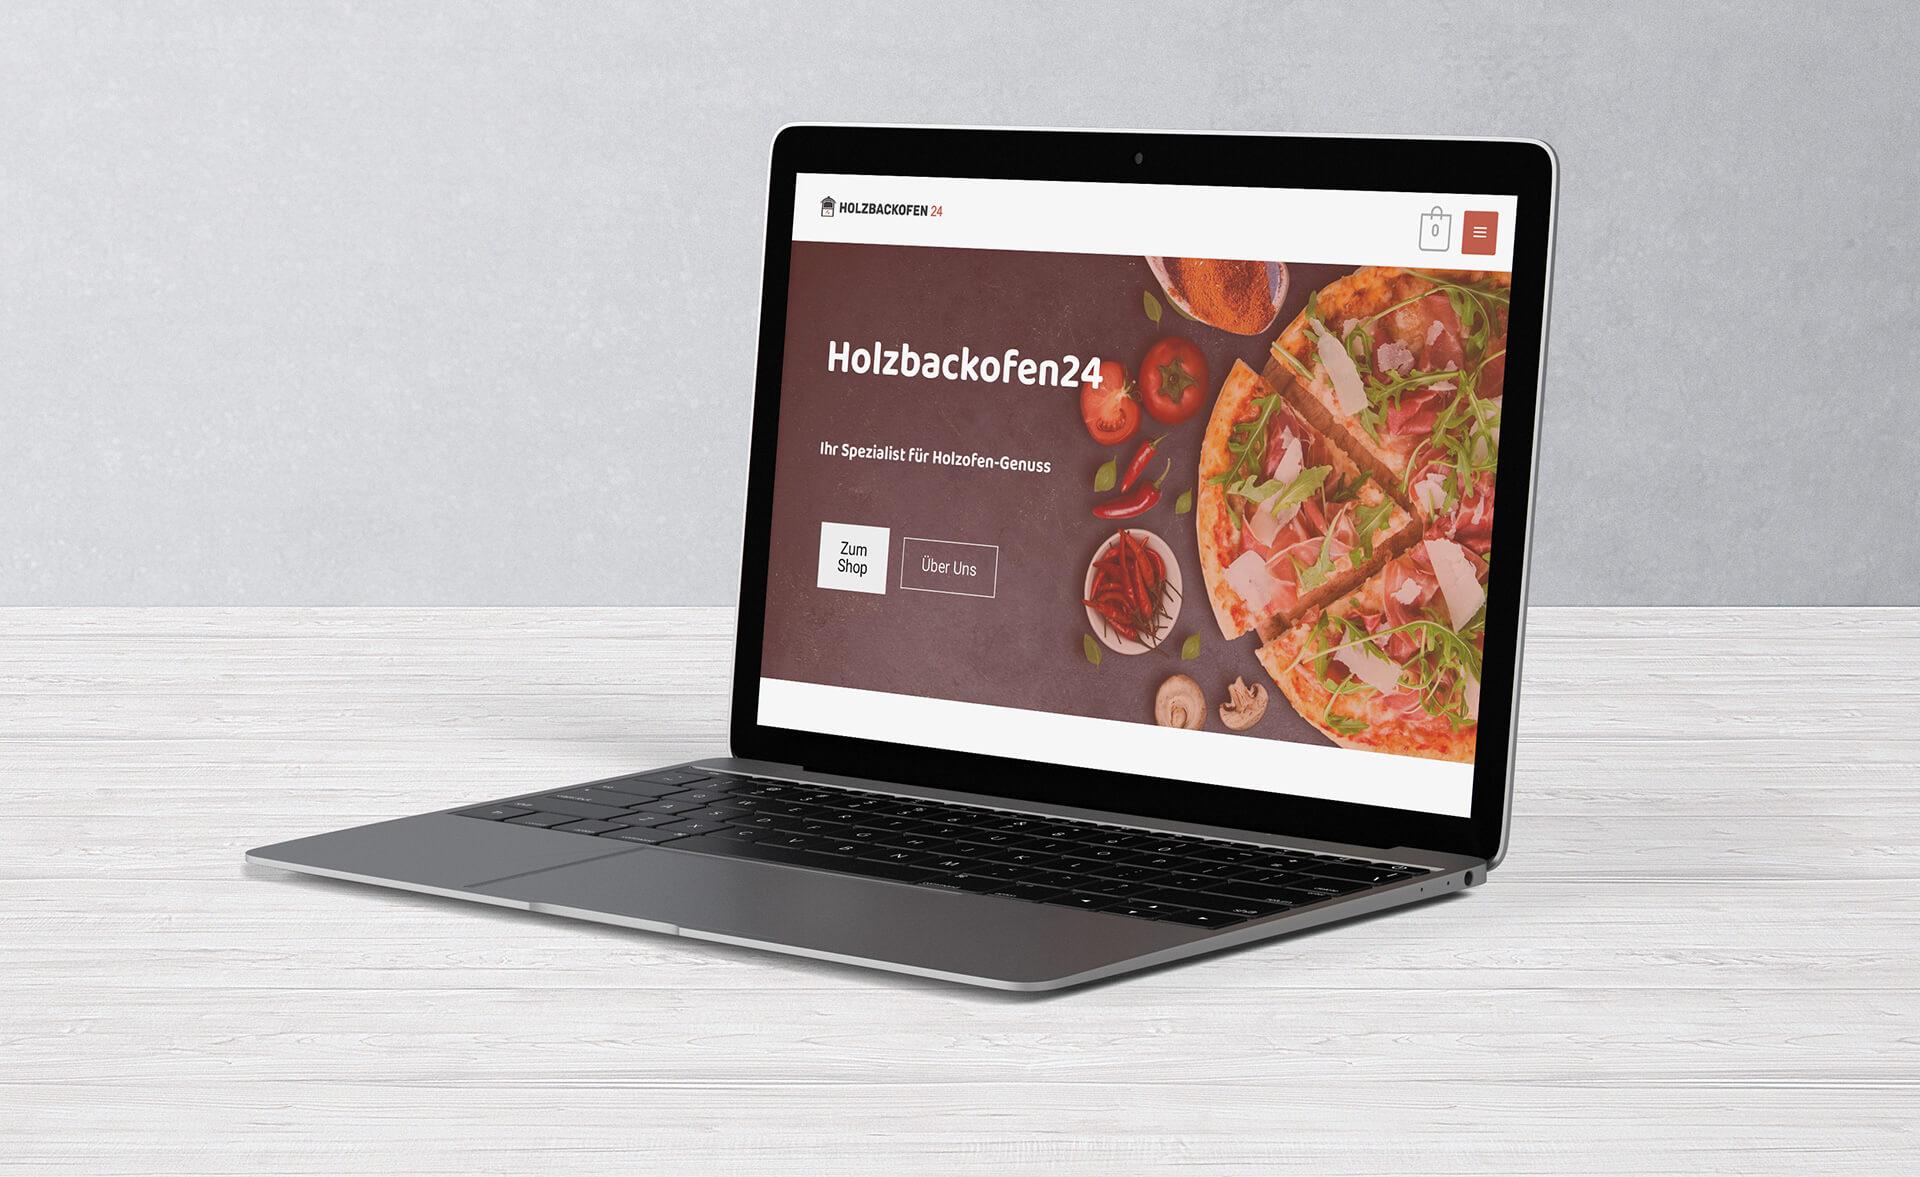 gniced-daniel gross-pfaffenhofen-grafikdesign-digital-webdesign-webentwicklung-4